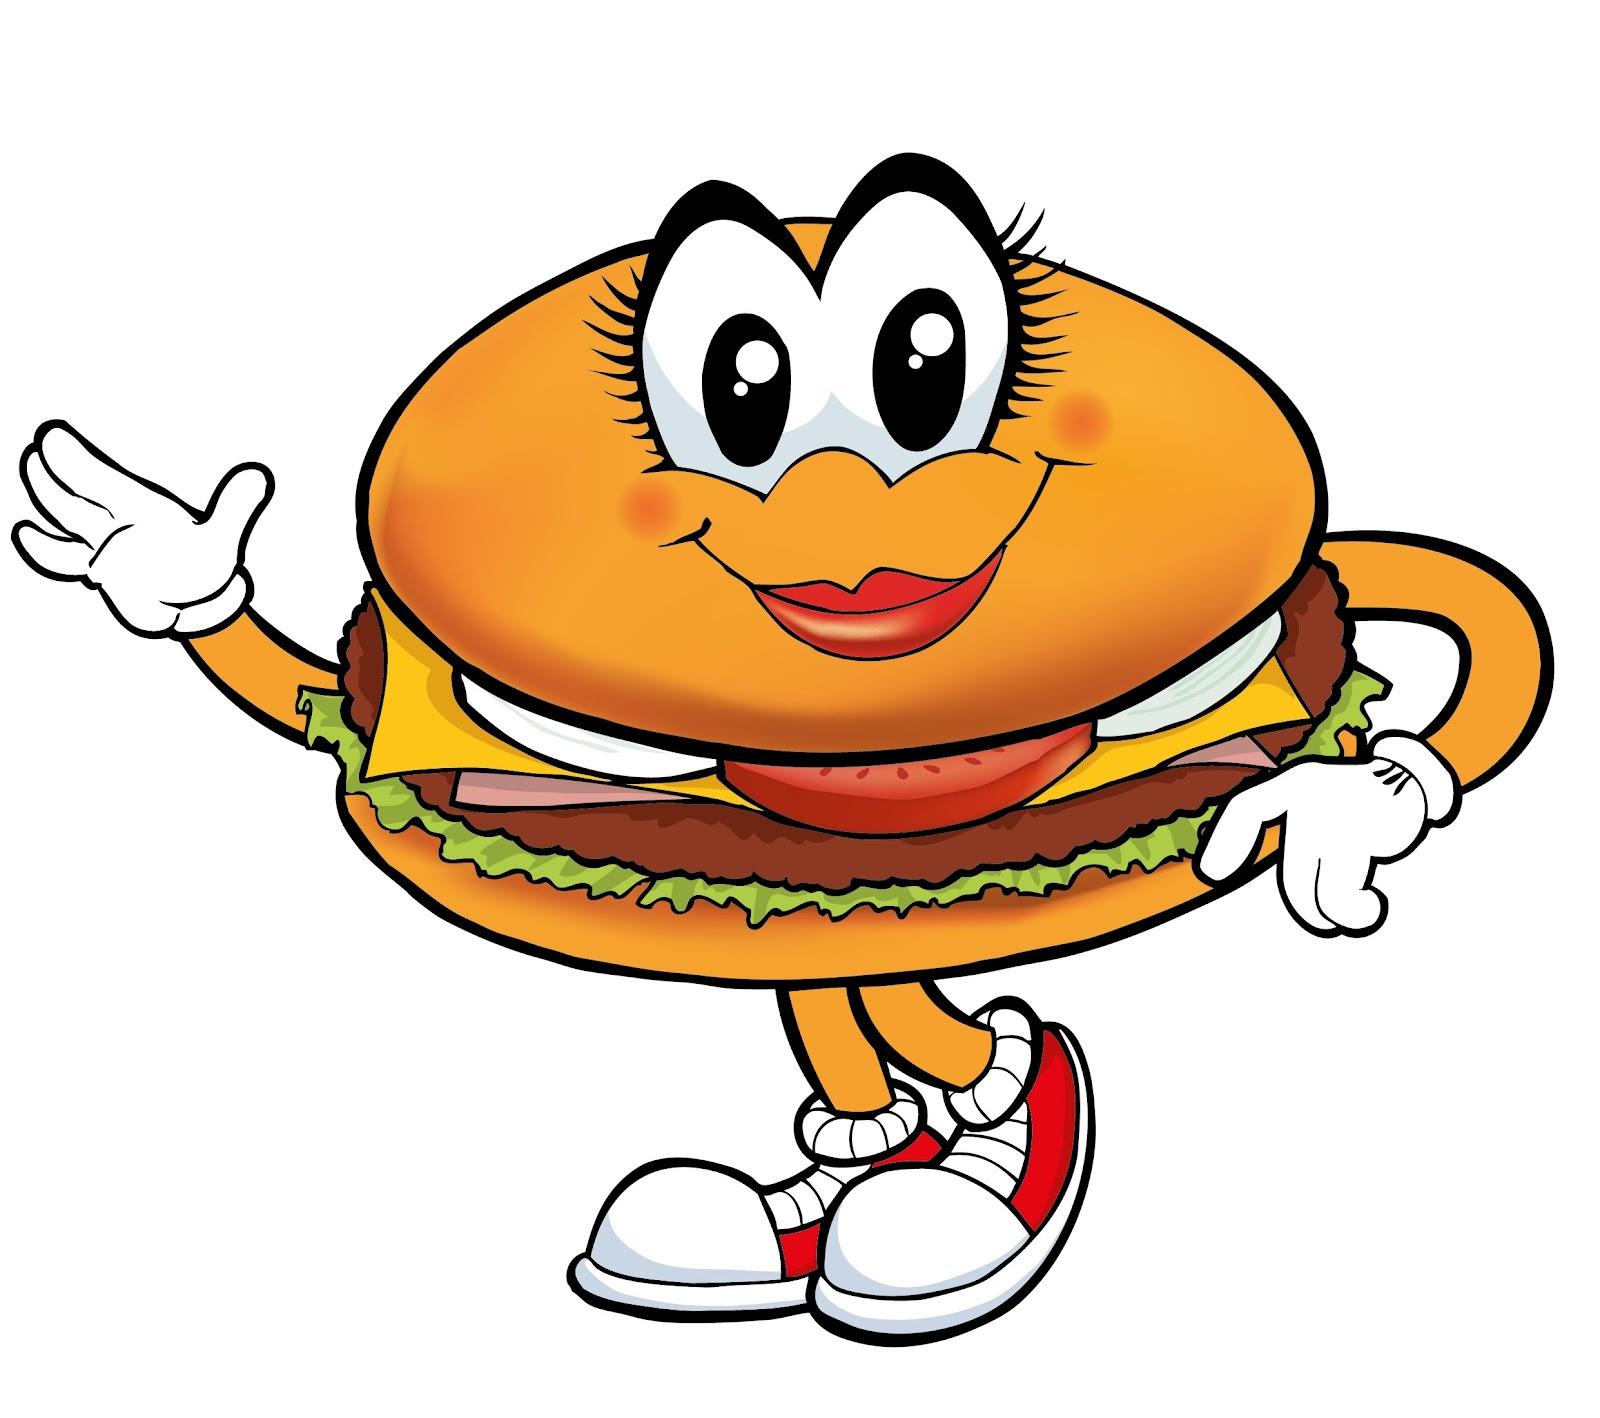 hamburguesa7_Vedetepenet.ro